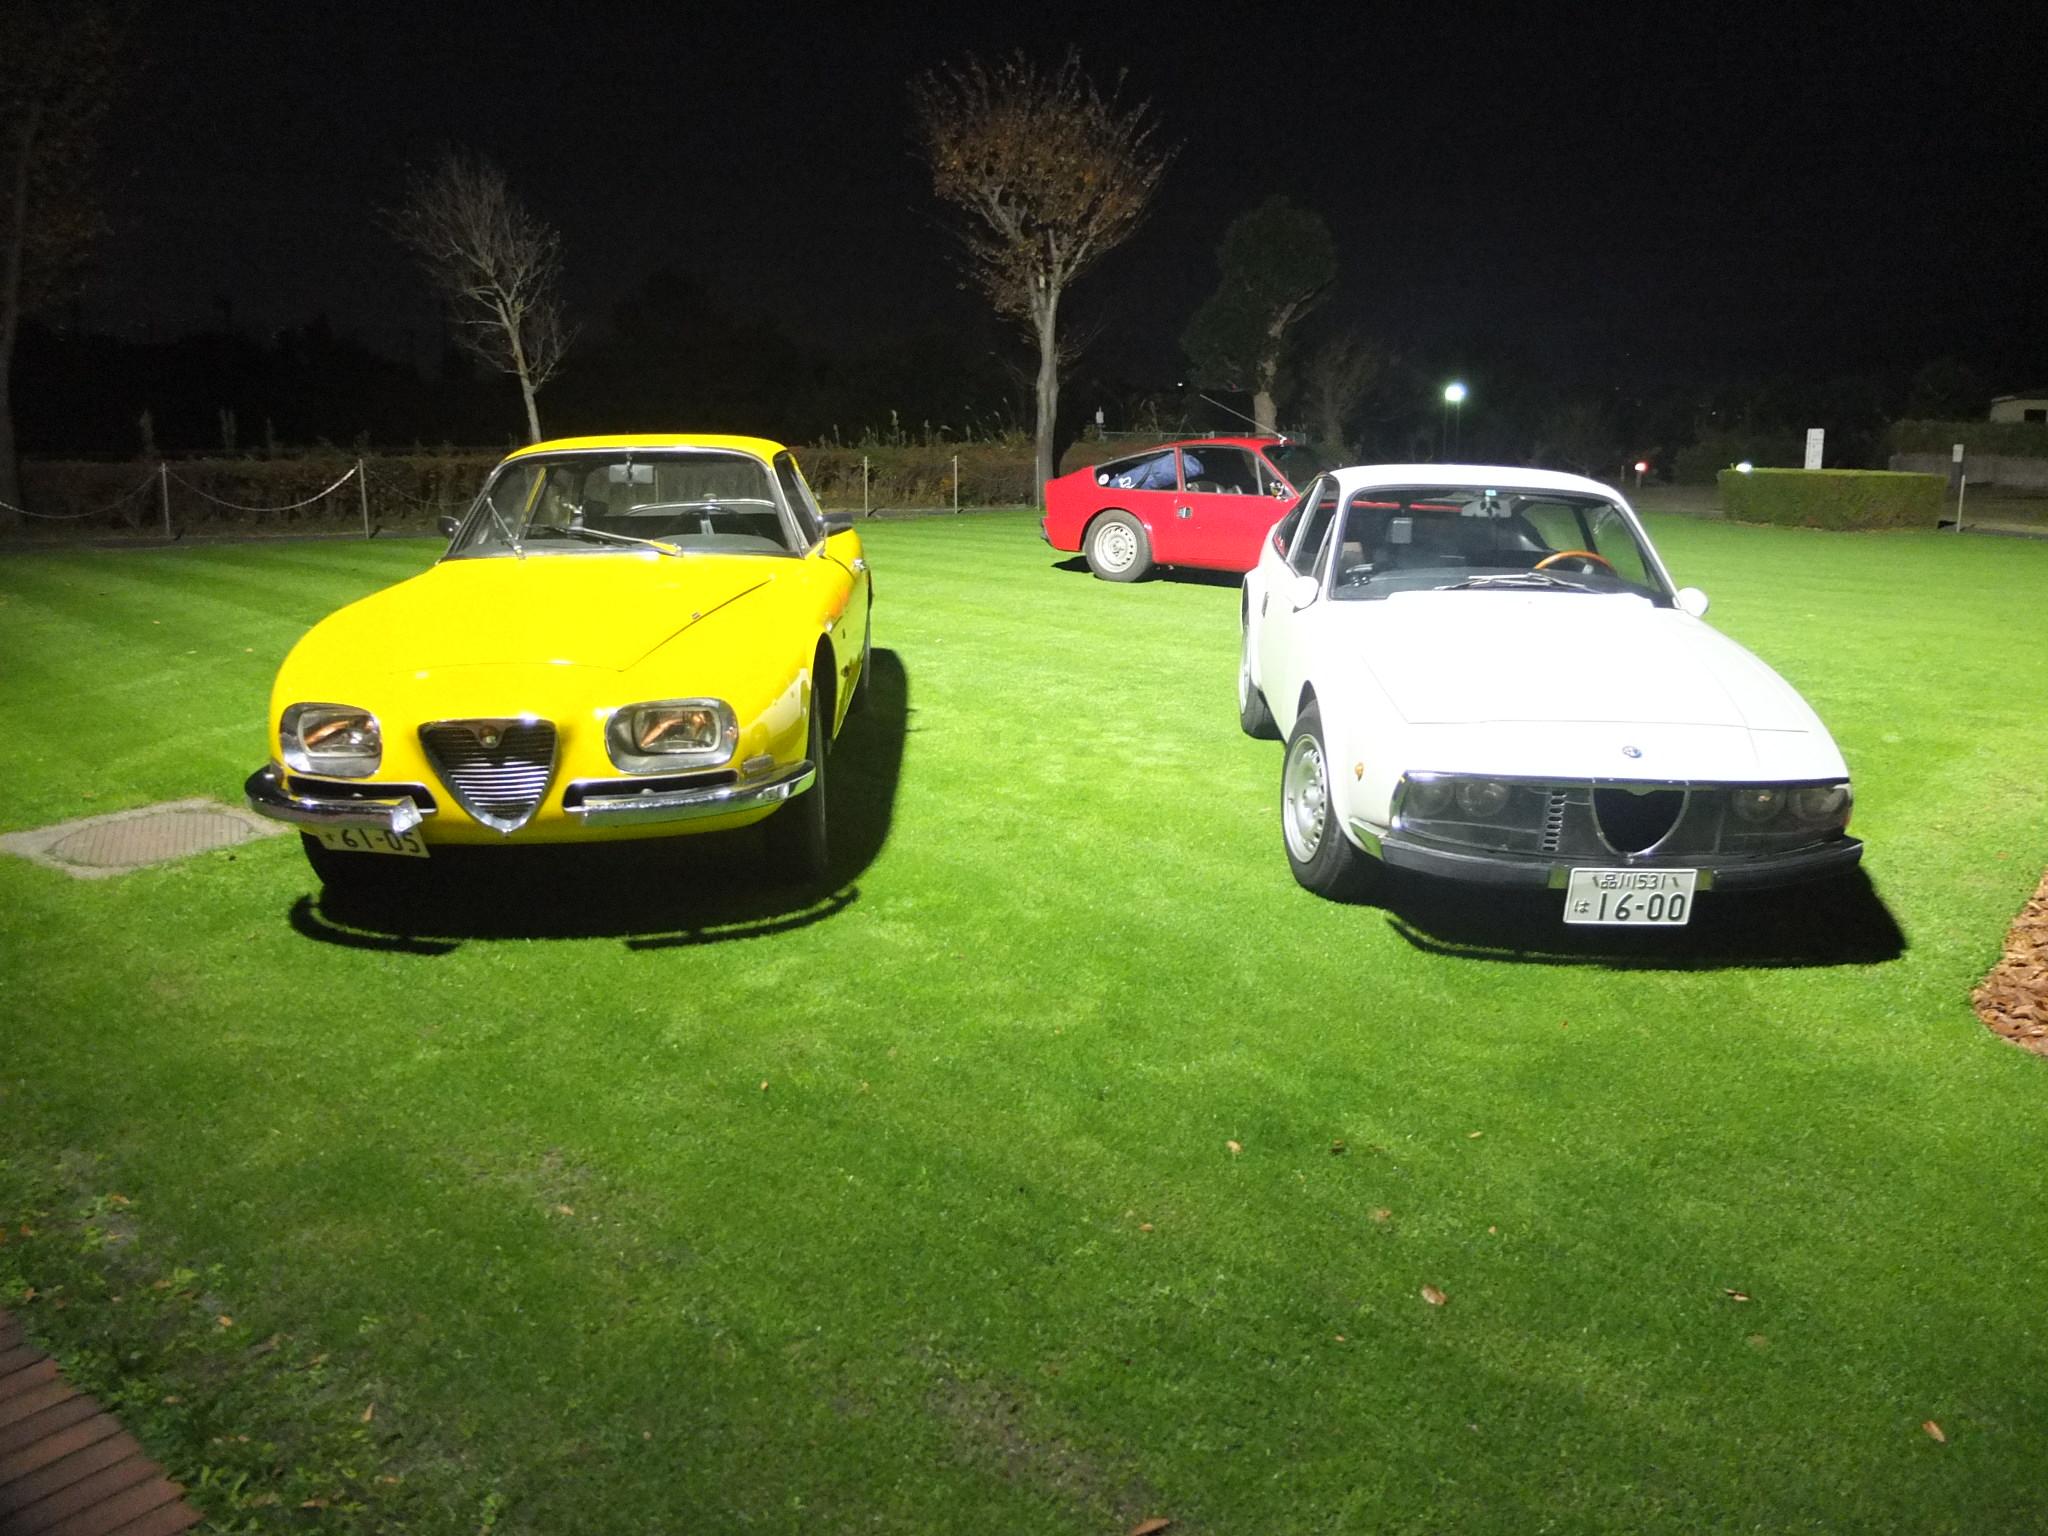 http://zagatoclub.jp/blog/DSCF8746.JPG